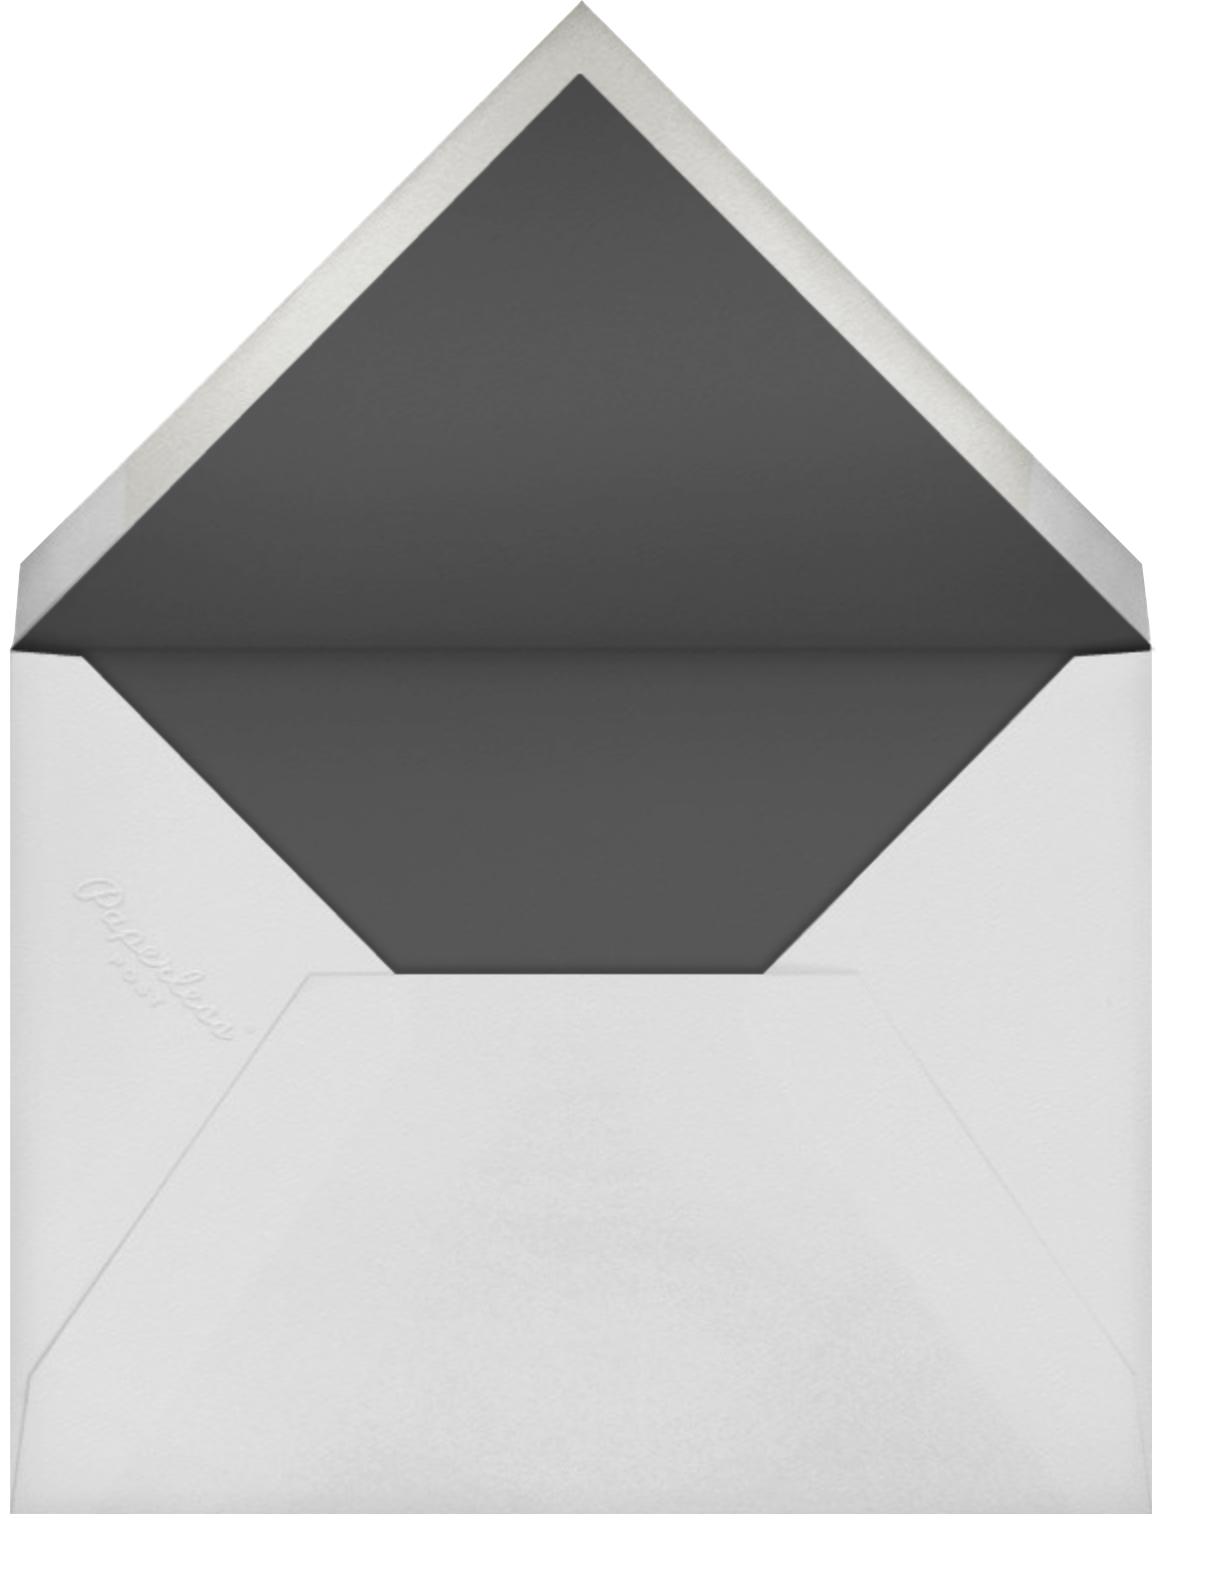 Palmier I (Stationery) - Newport Blue  - Paperless Post - null - envelope back